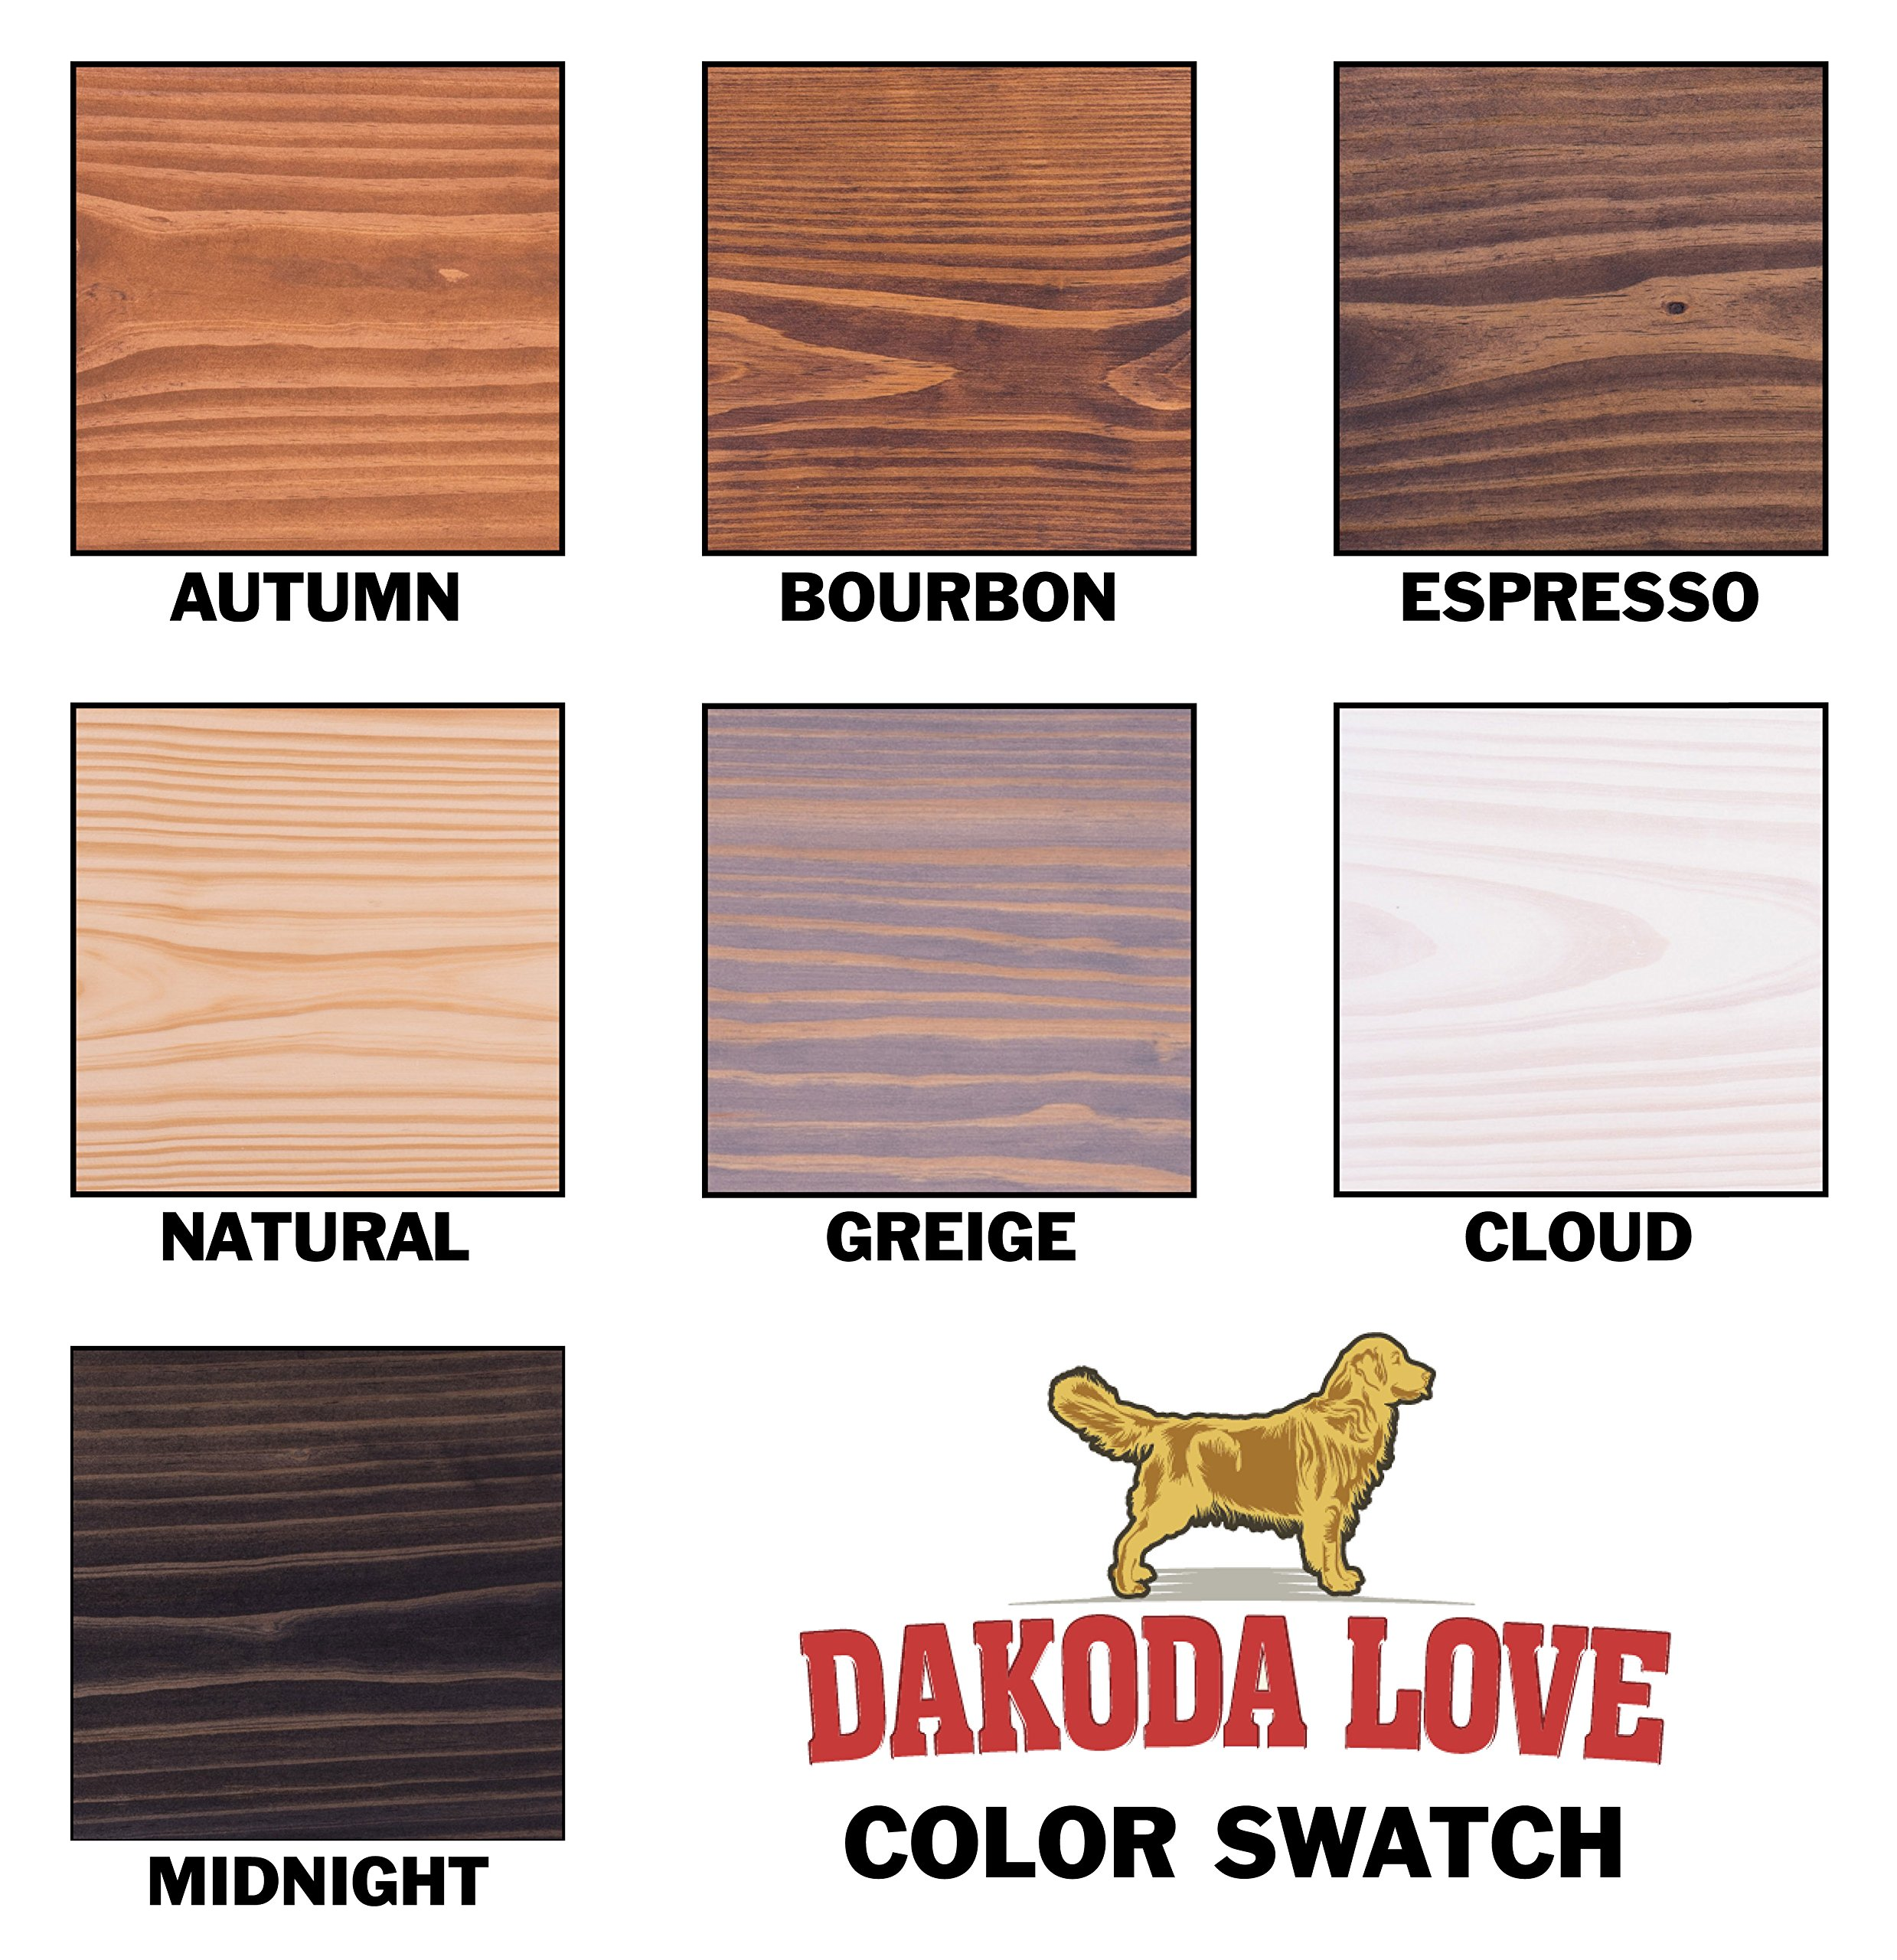 DAKODA LOVE 5.25'' Deep Weathered Edge Floating Shelves, USA Handmade, Clear Coat Finish, 100% Countersunk Hidden Floating Shelf Brackets, Beautiful Grain Pine Wood Rustic (Set of 2) (36'', Greige) by DAKODA LOVE (Image #7)